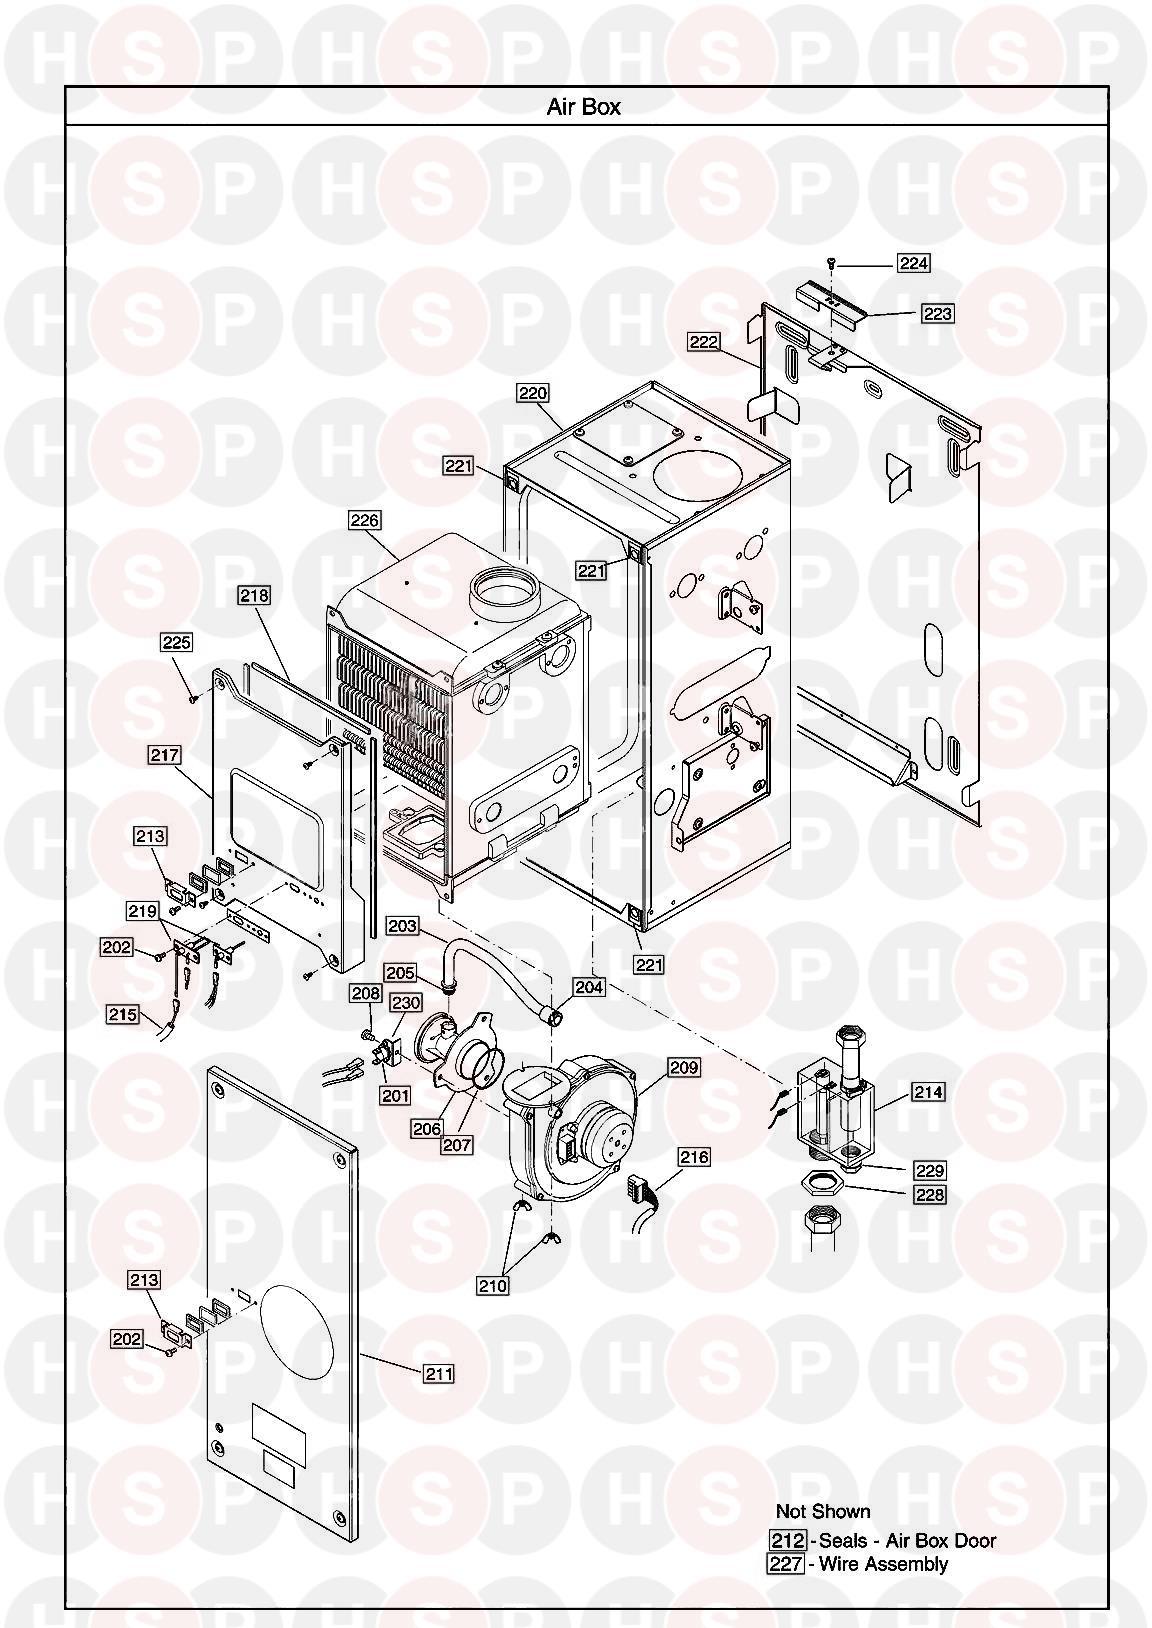 baxi 100 he  air box  diagram